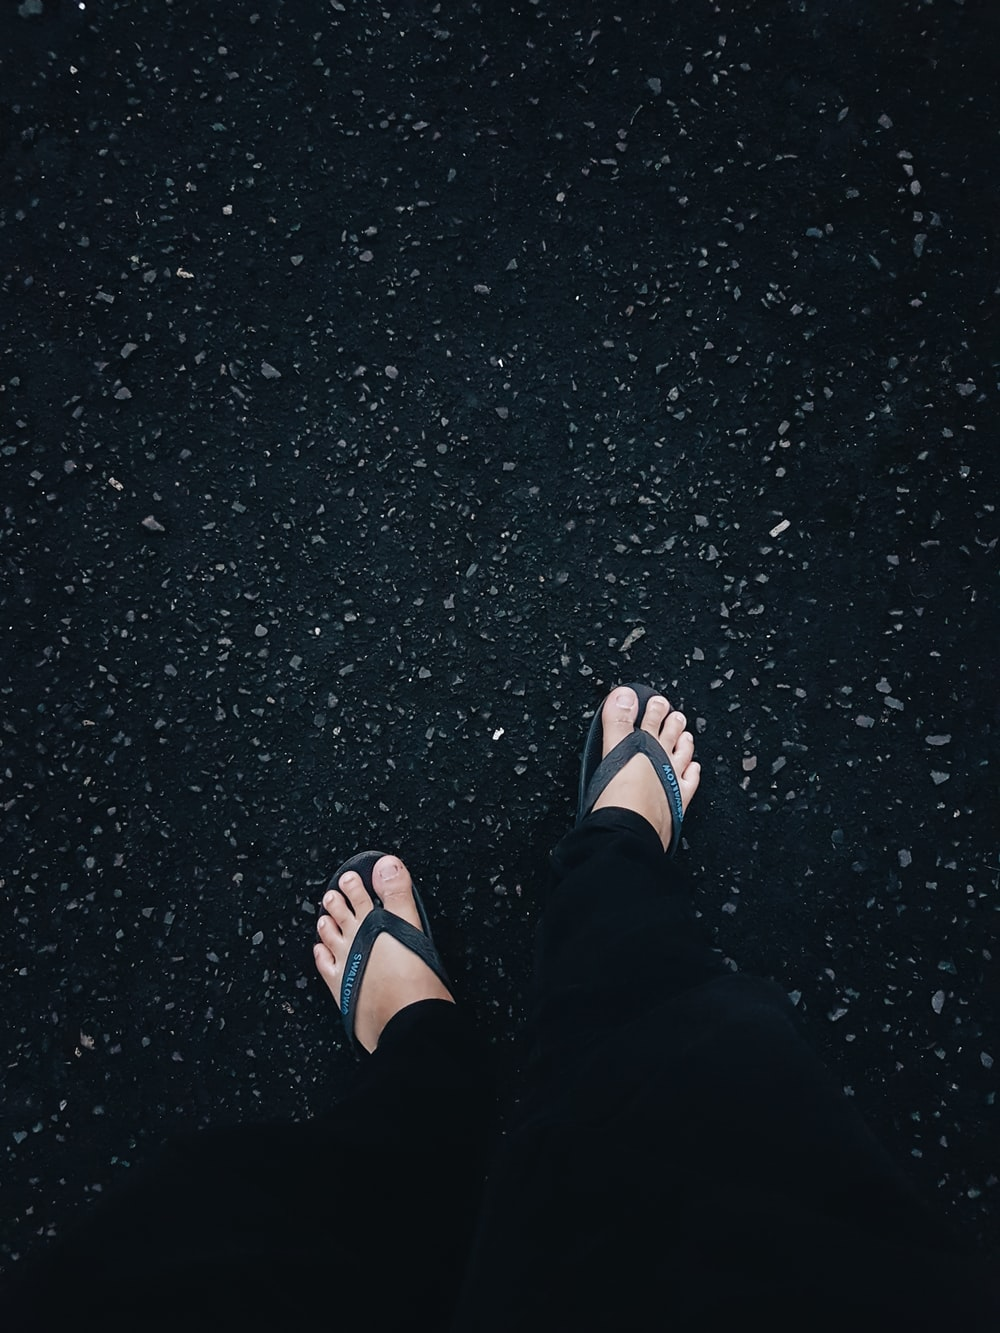 person in black flip flops and black pants standing on black asphalt floor